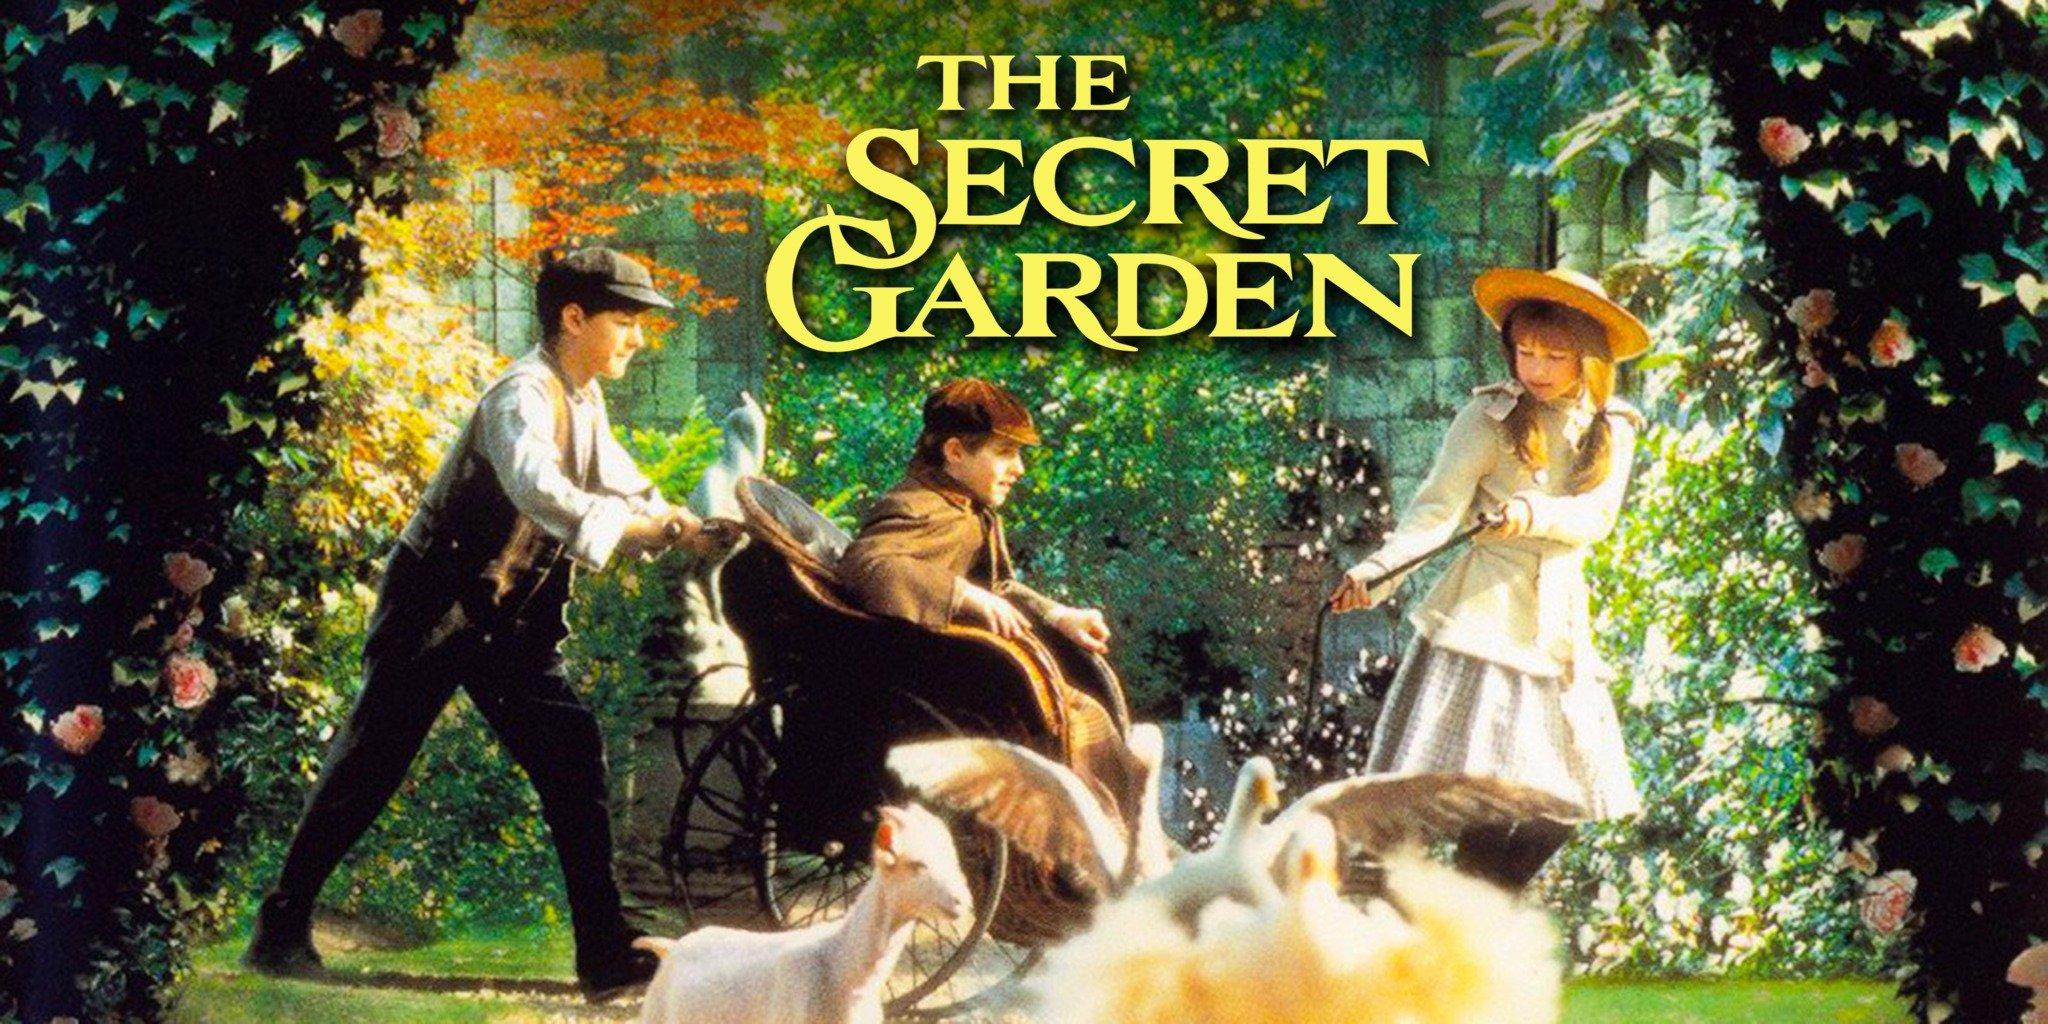 the secret garden movie essay Free and custom essays at essaypediacom take a look at written paper - family values in movies the secret garden.